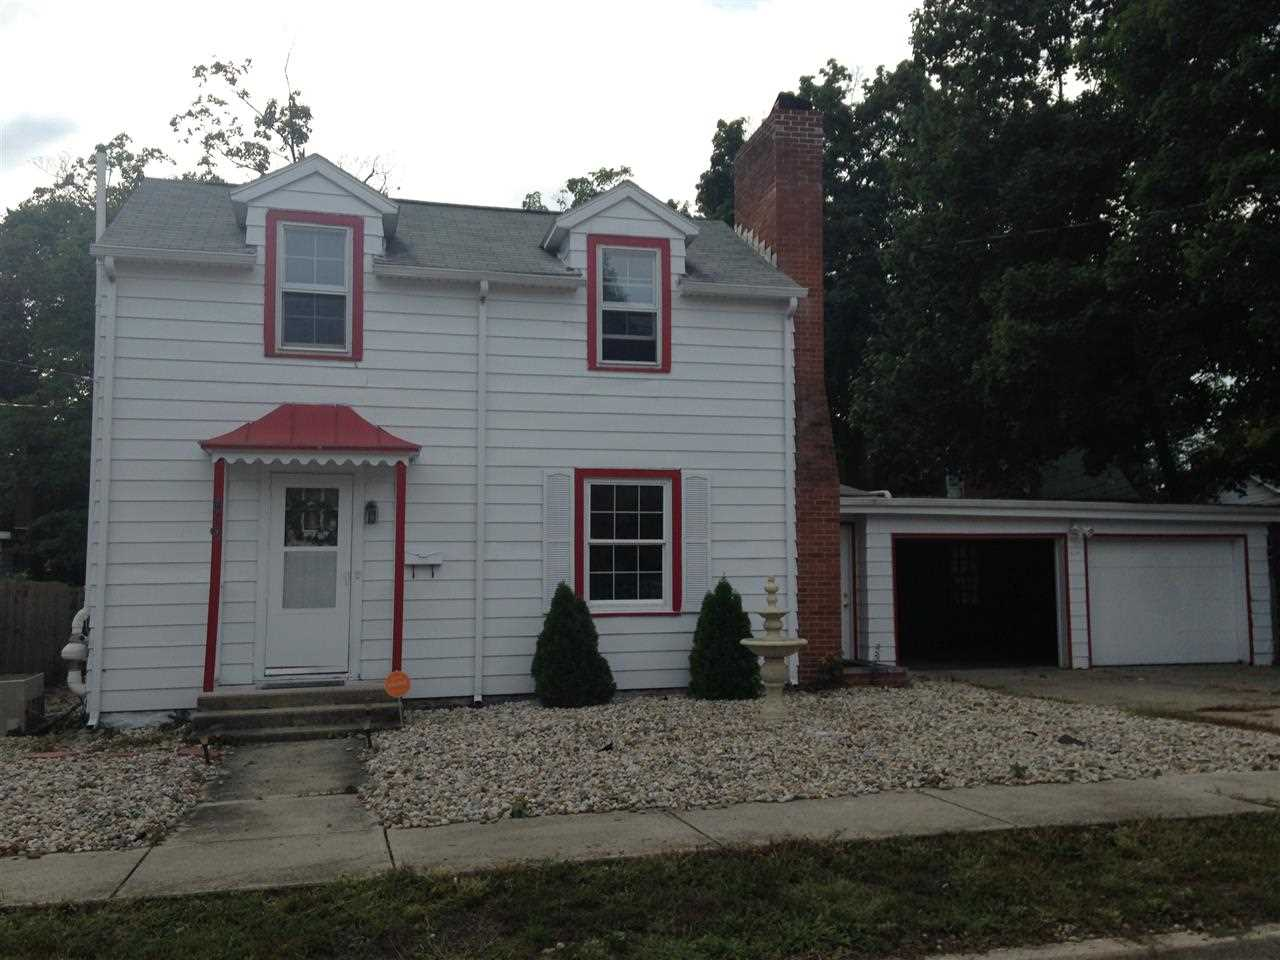 419 S Cottage Ave Goshen, IN 46526